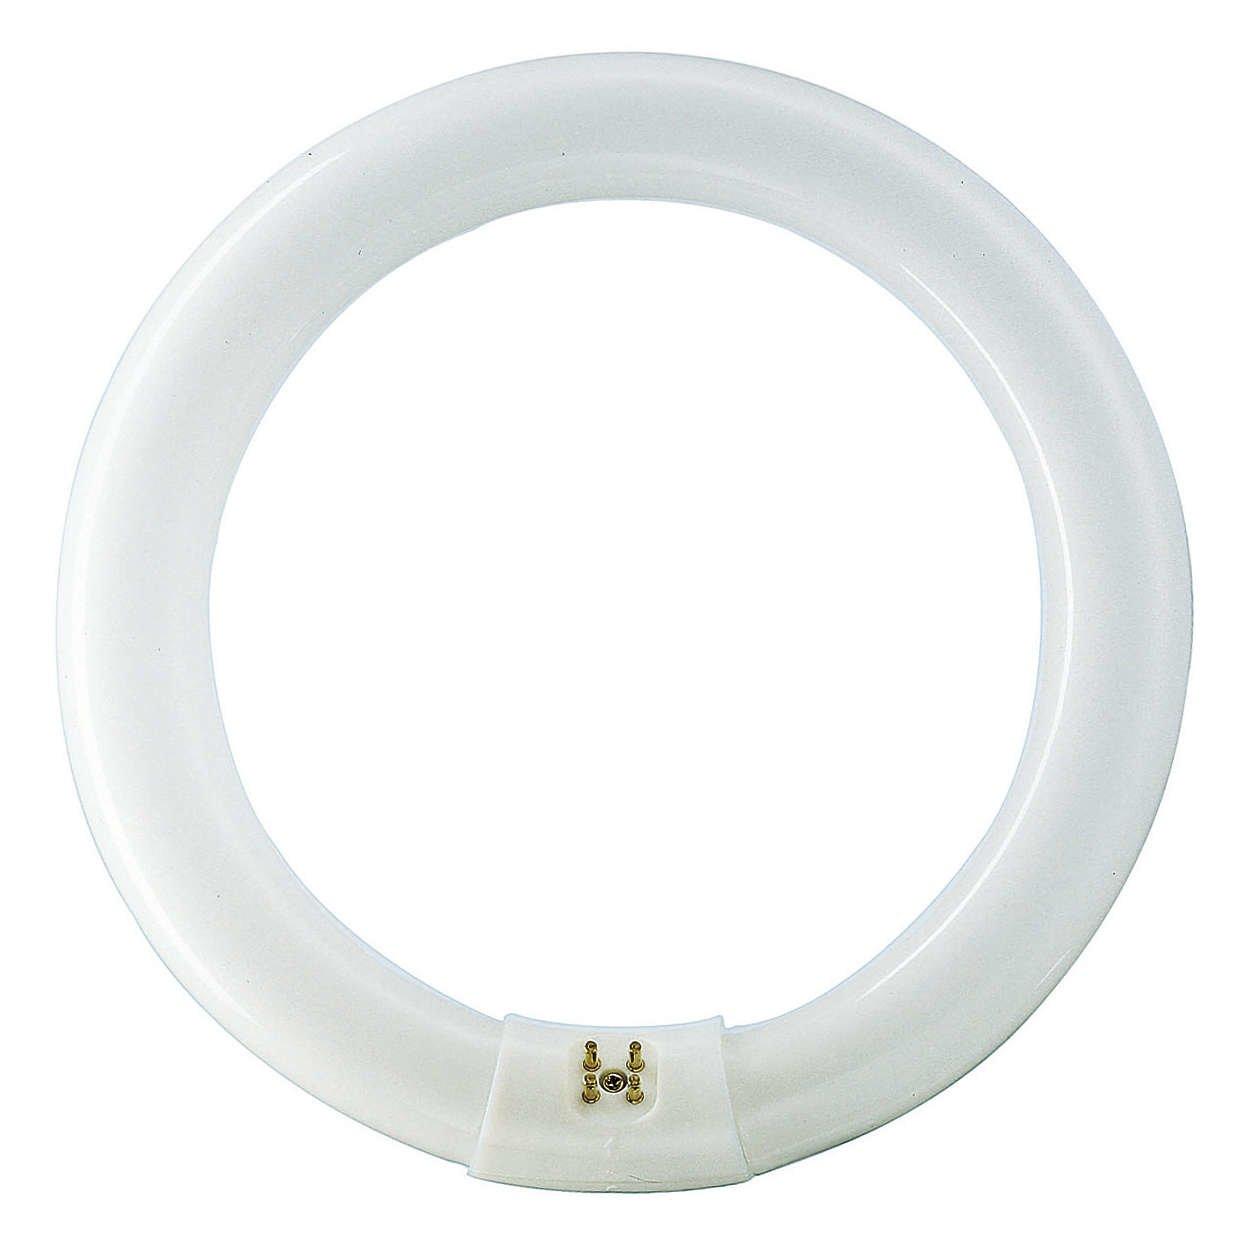 Leuchtstofflampe TL-E PRO 32 Watt 830 - Philips 55967815